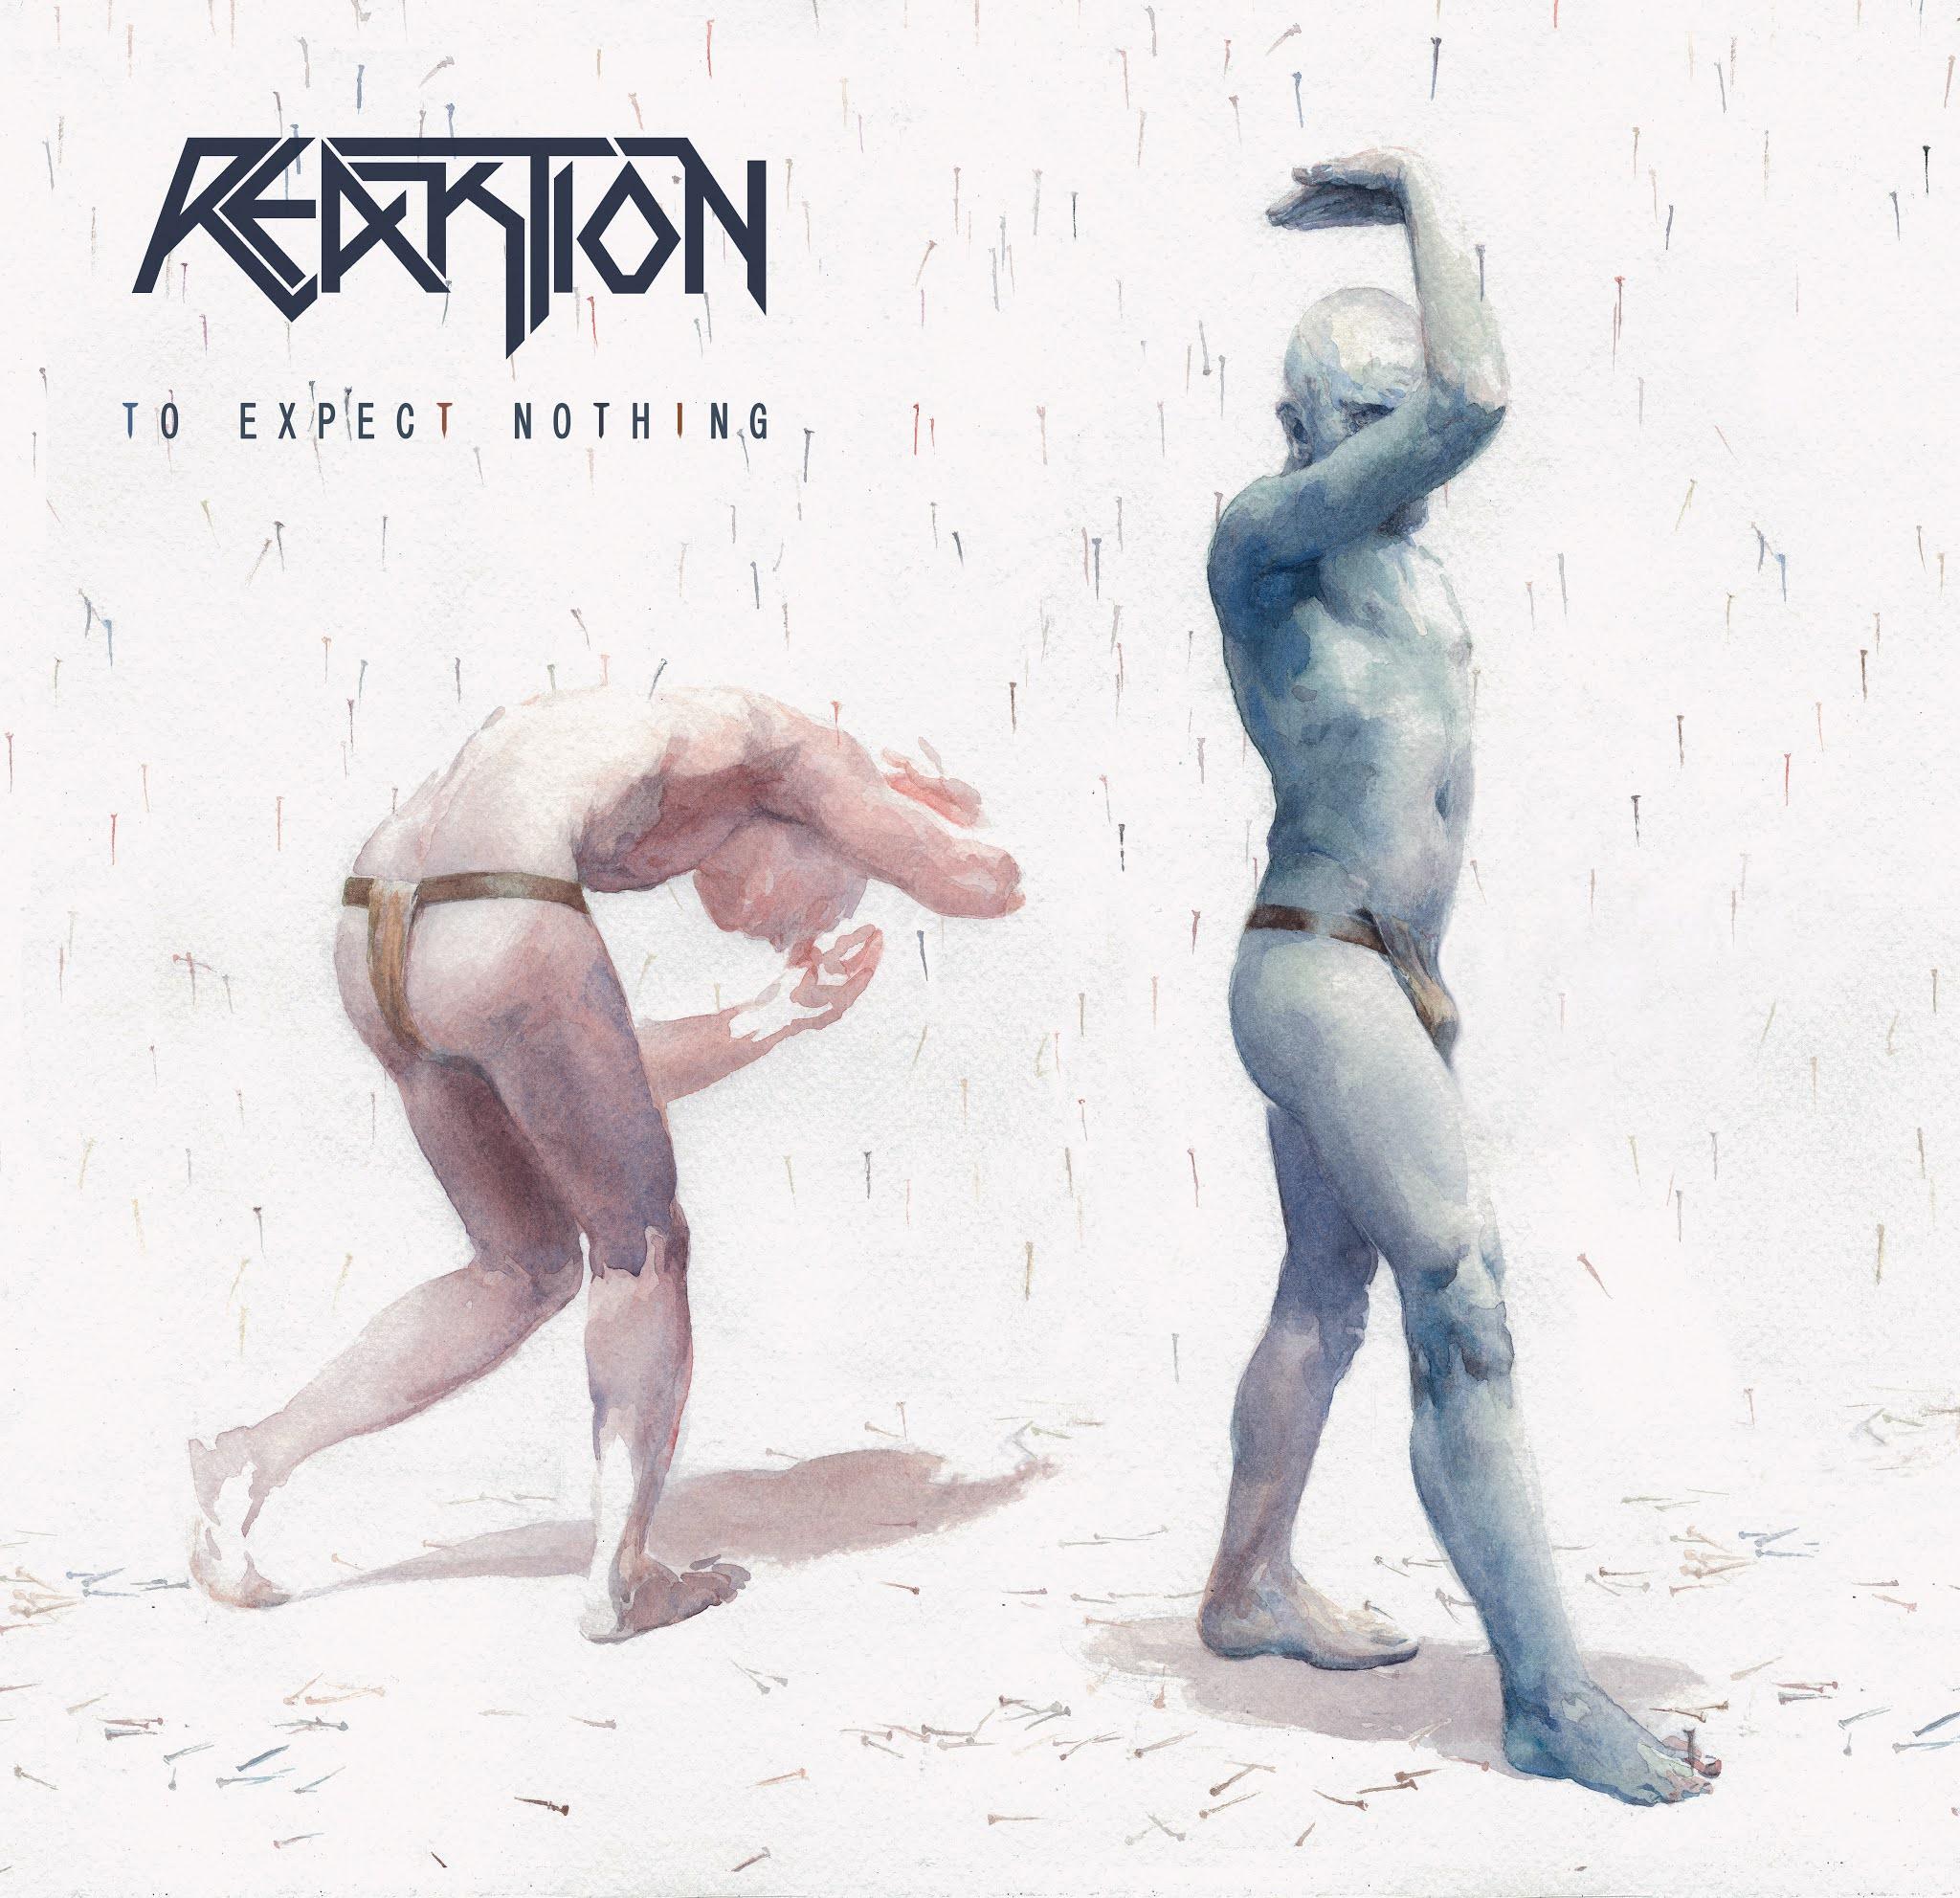 Reaktion cover album